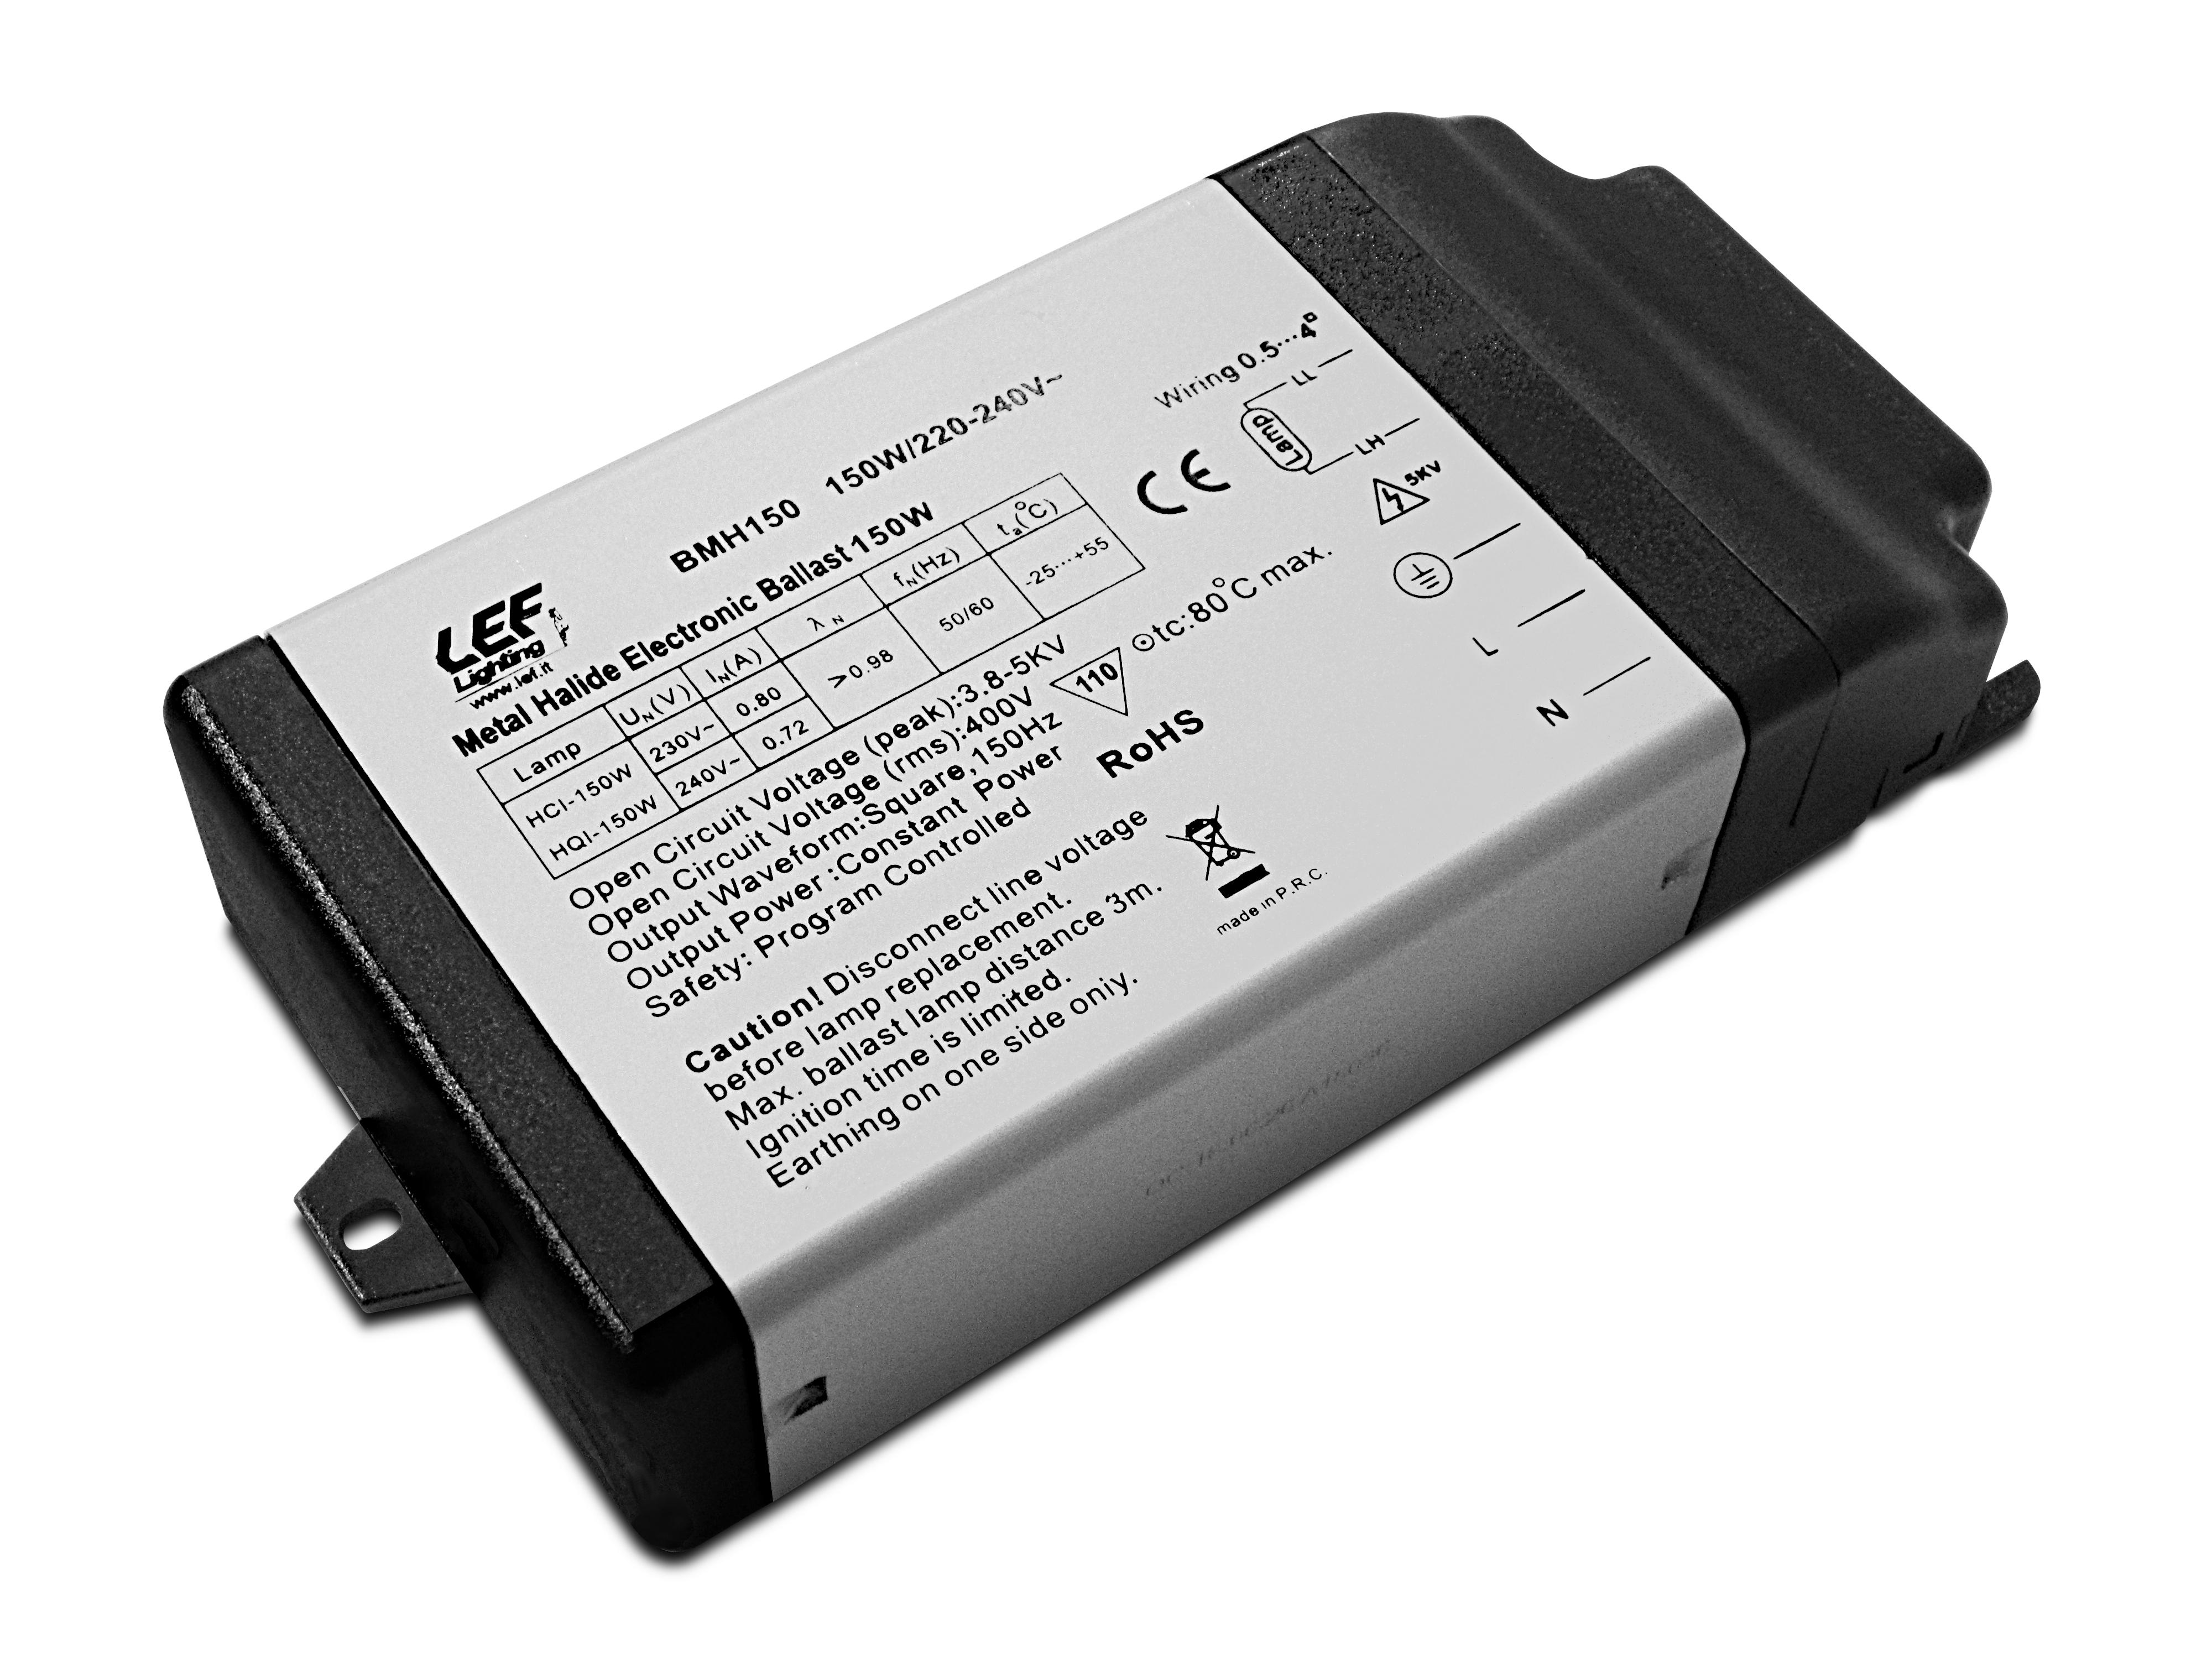 ALIM. EL. X LAMP SCAR 150W CL2 181X90X39